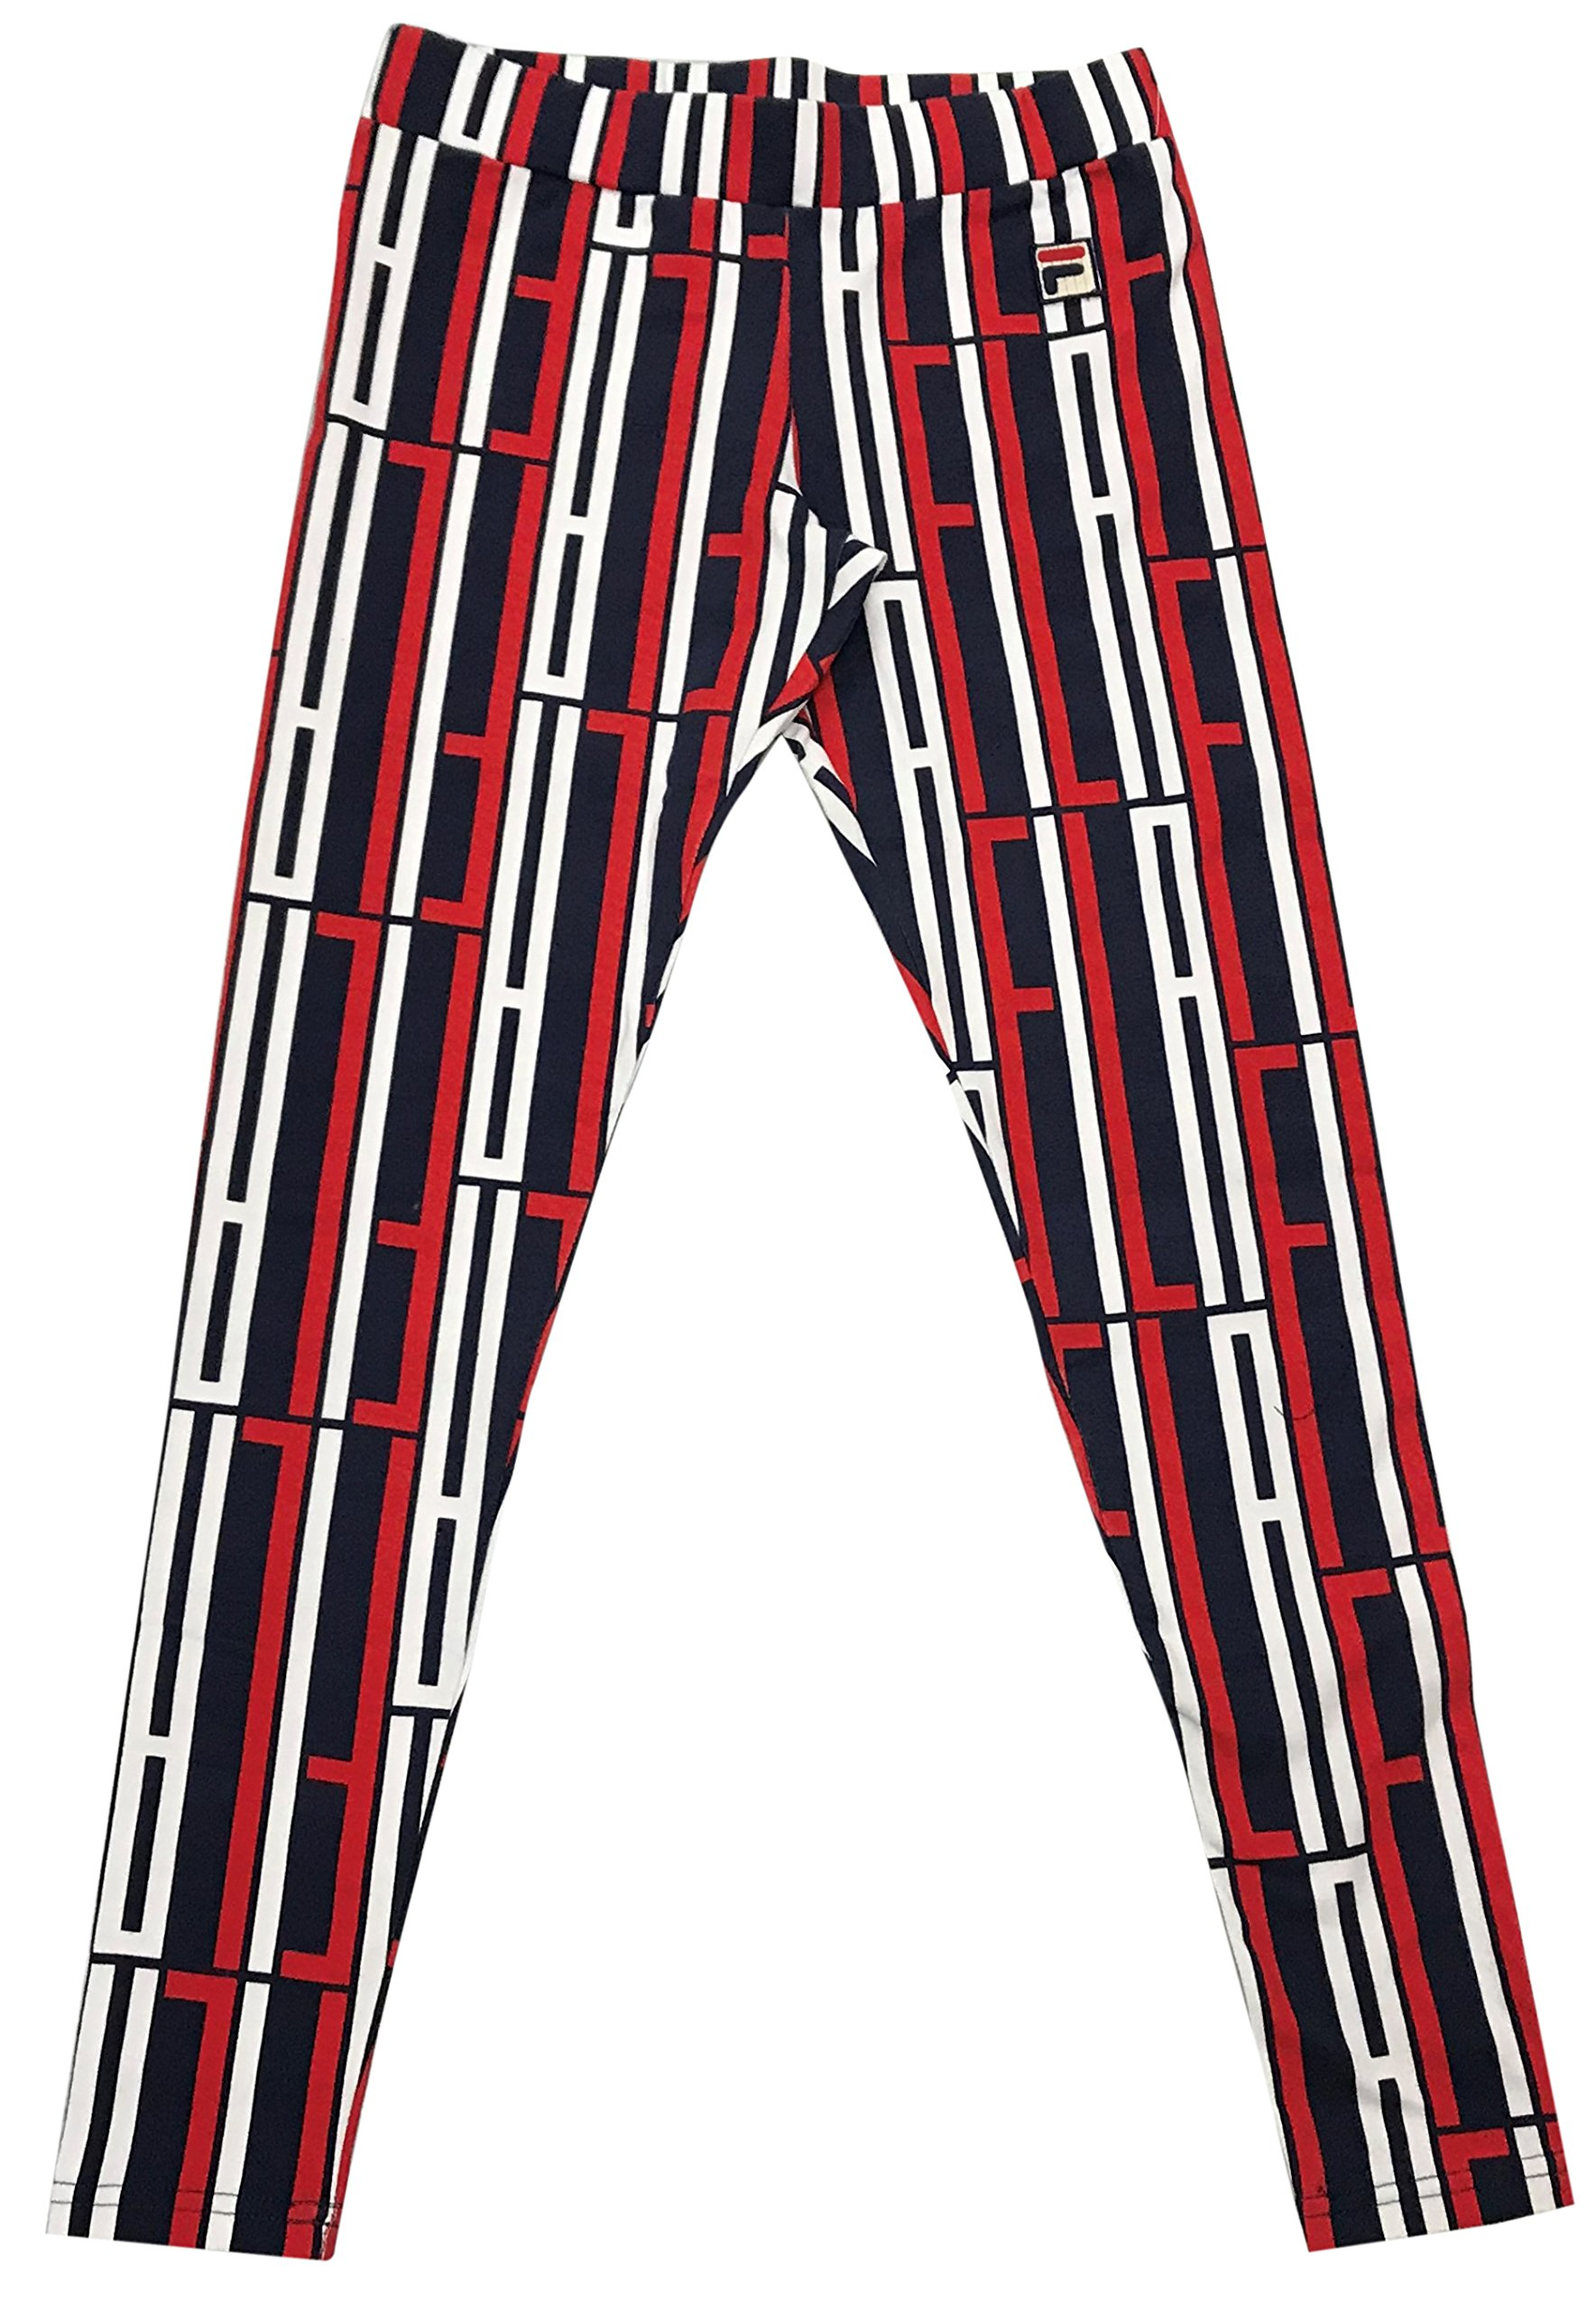 Fila Petra Leggings (Peacoat/Chinese Red-White, S)